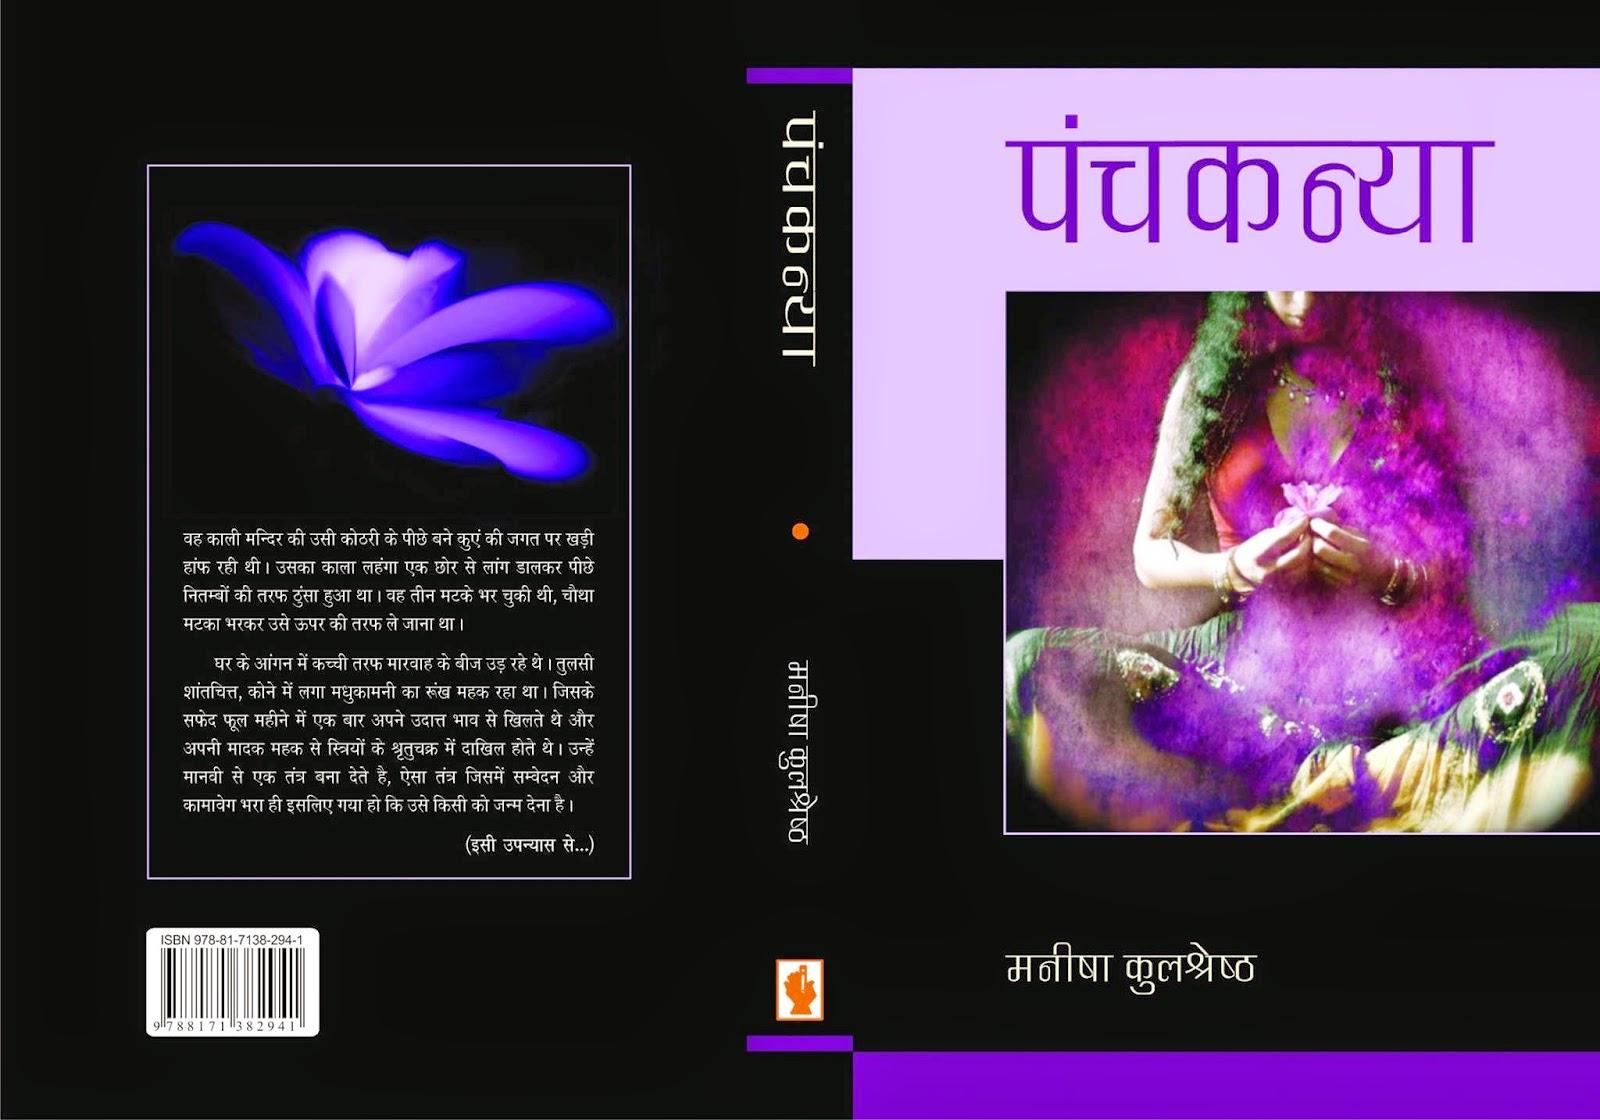 पंचकन्या, सामयिक प्रकाशन, जटवाडा दरियागंज नई दिल्ली -110002 कीमत 395 रुपए